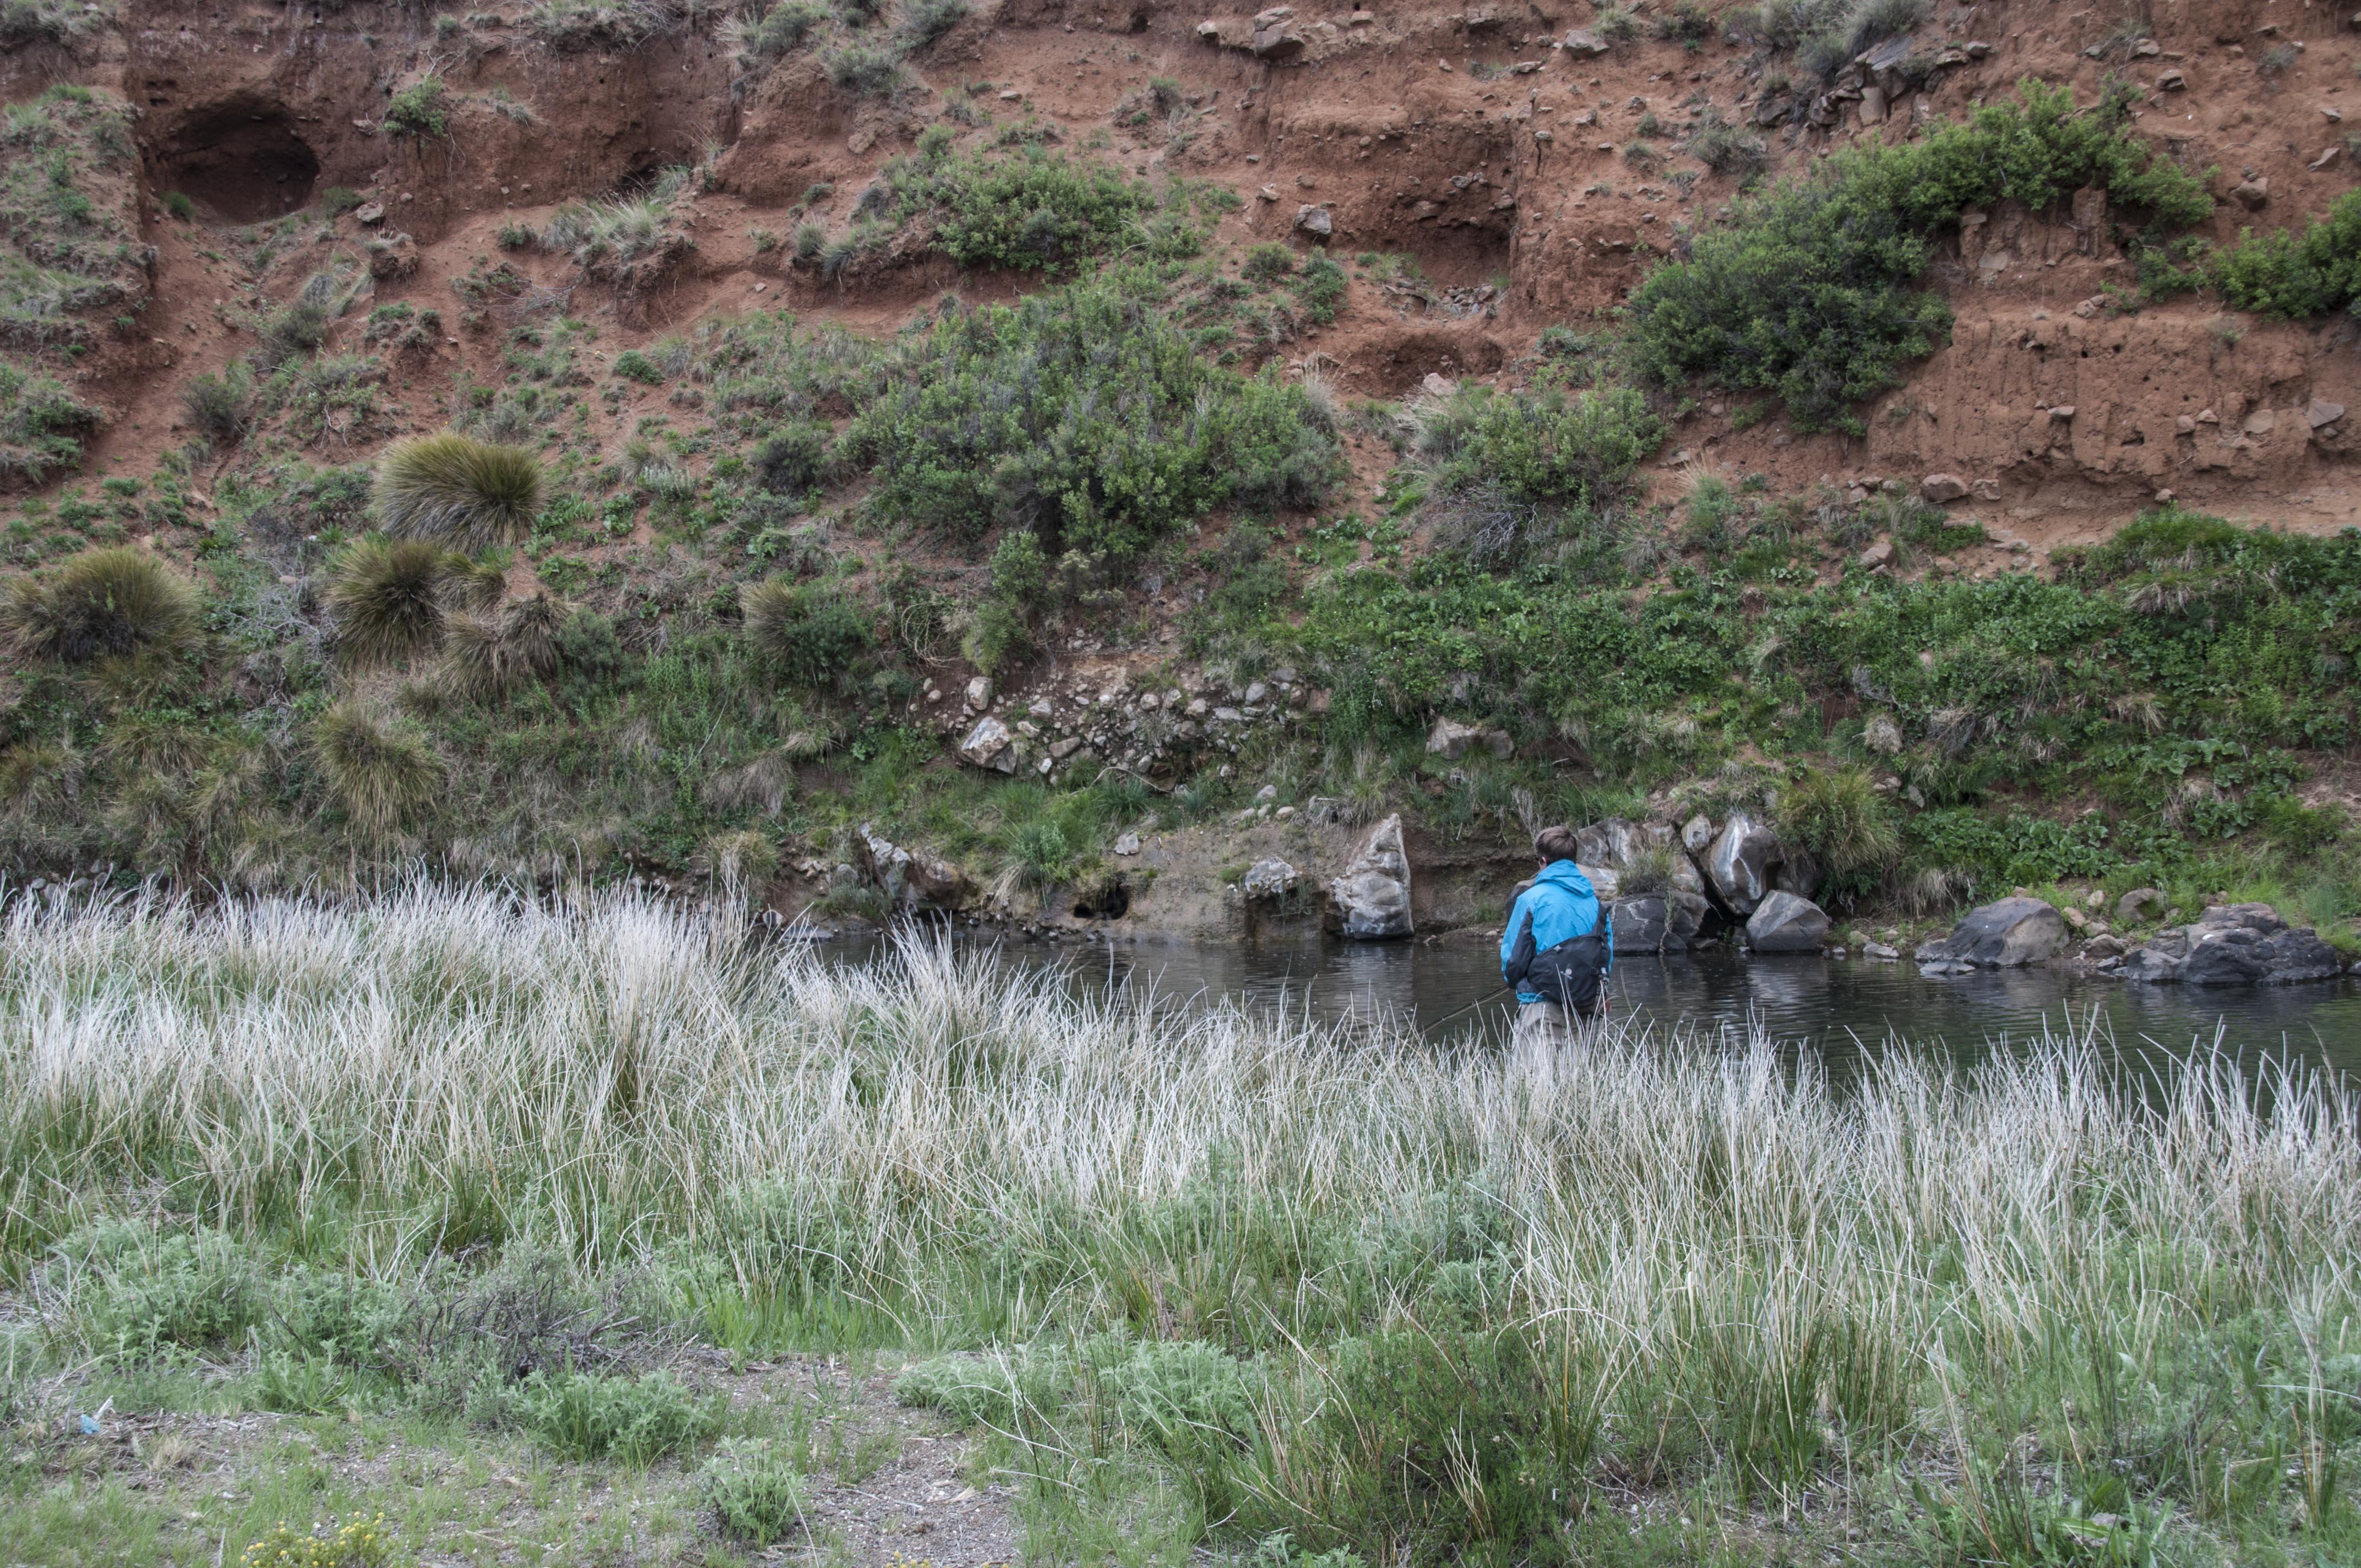 lesotho_fly_fishing_adventure-002